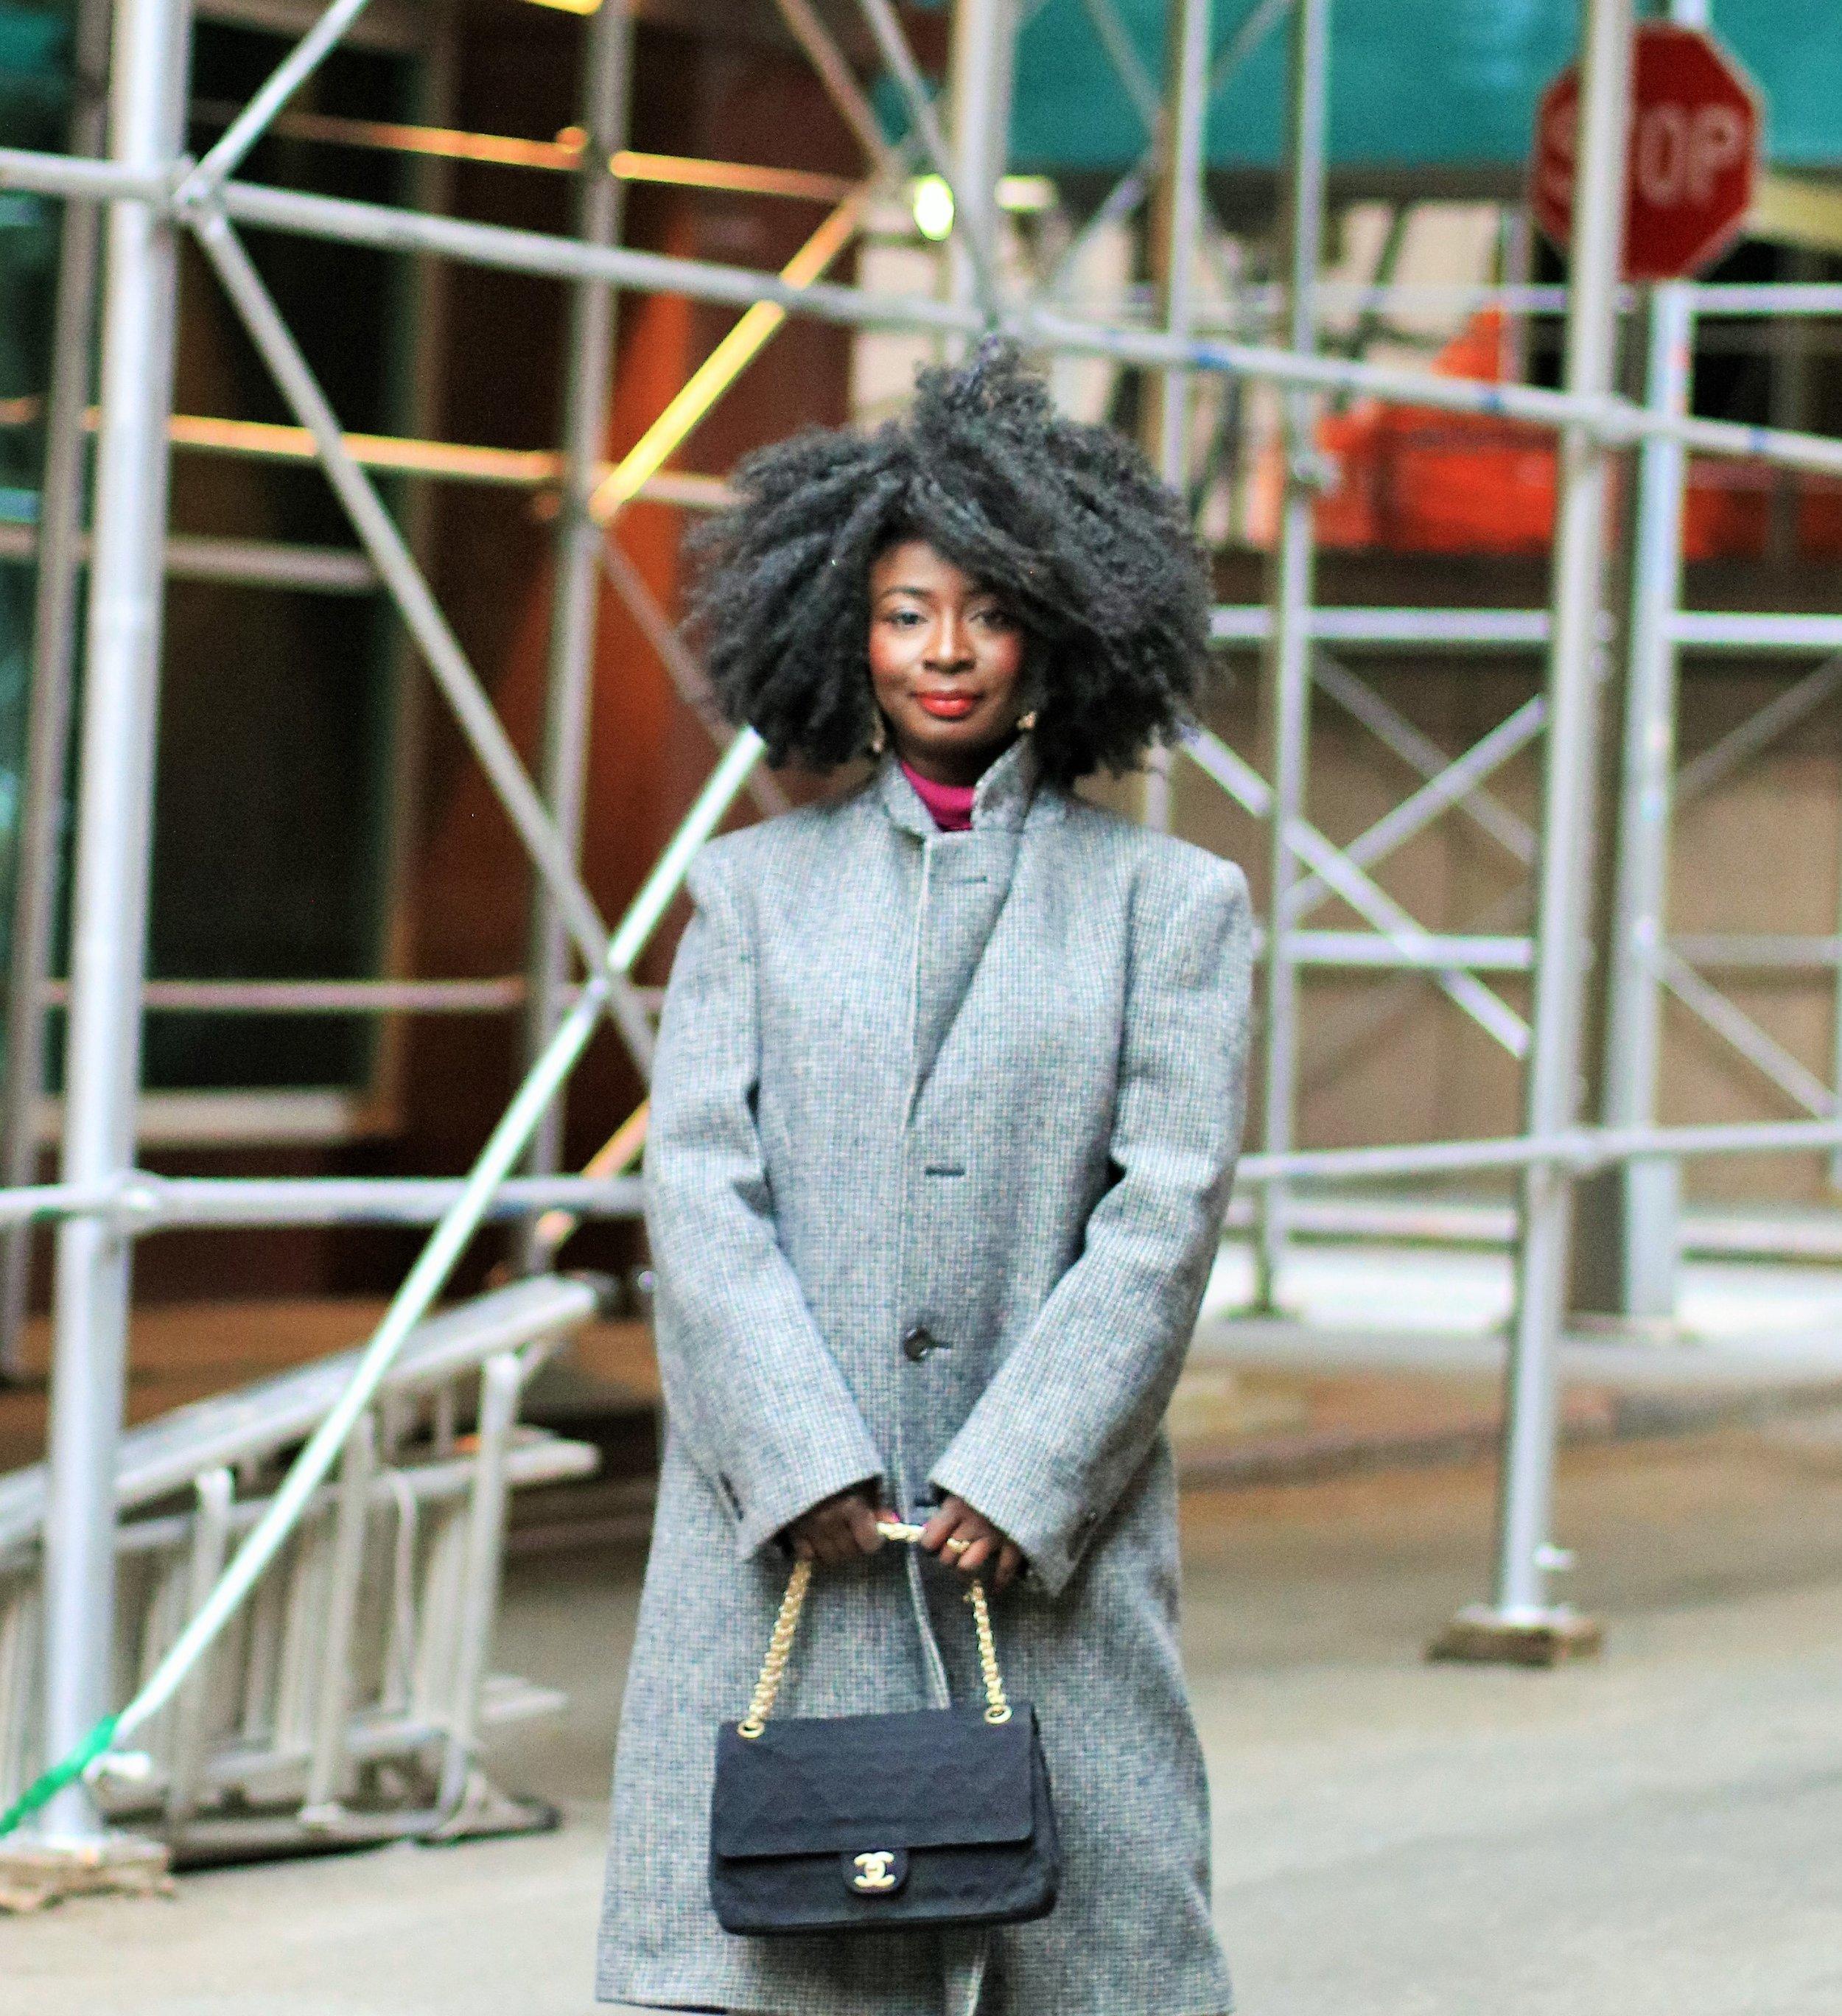 Women-Plaid-Coat-Outfits